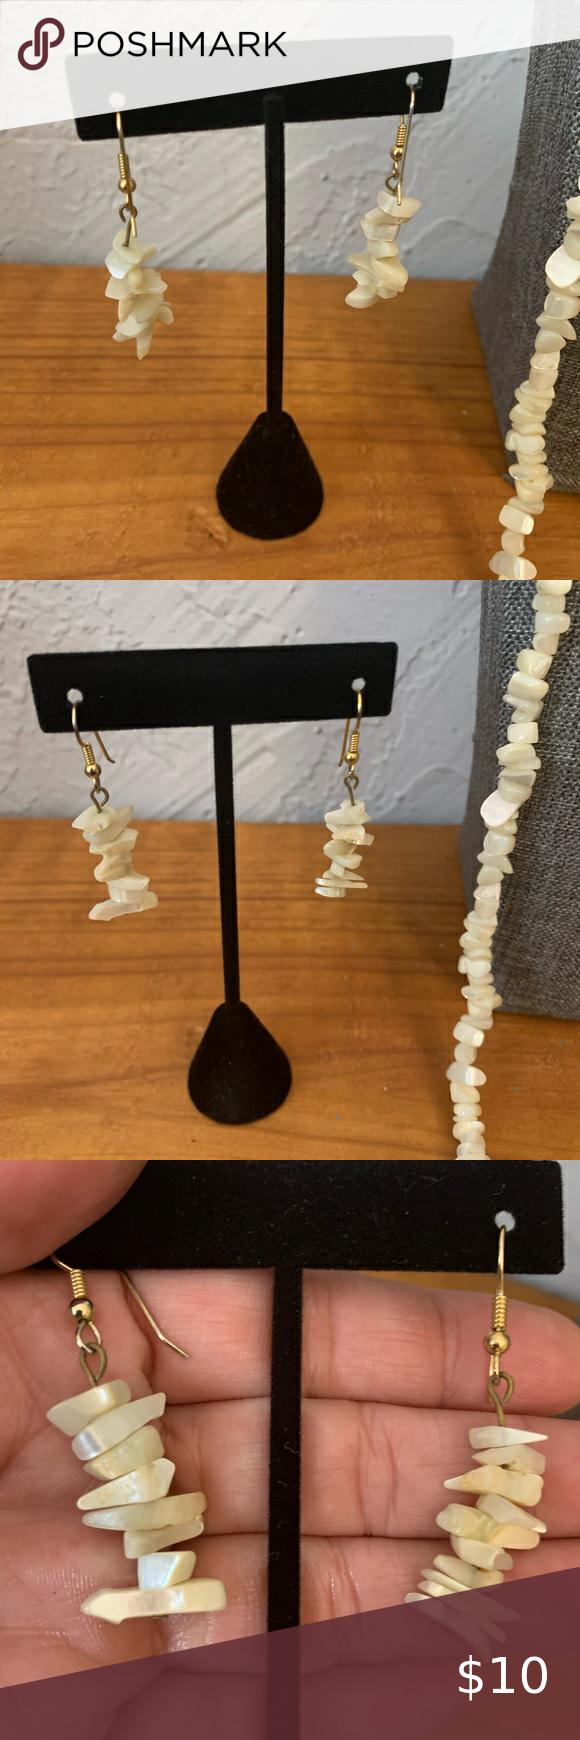 White Sea Shell Earrings One Of A Kind Shell Earrings Seashell Jewelry Real Shell Jewelry Gift For Her Beach In 2020 Shell Earrings Seashell Jewelry Shell Jewelry